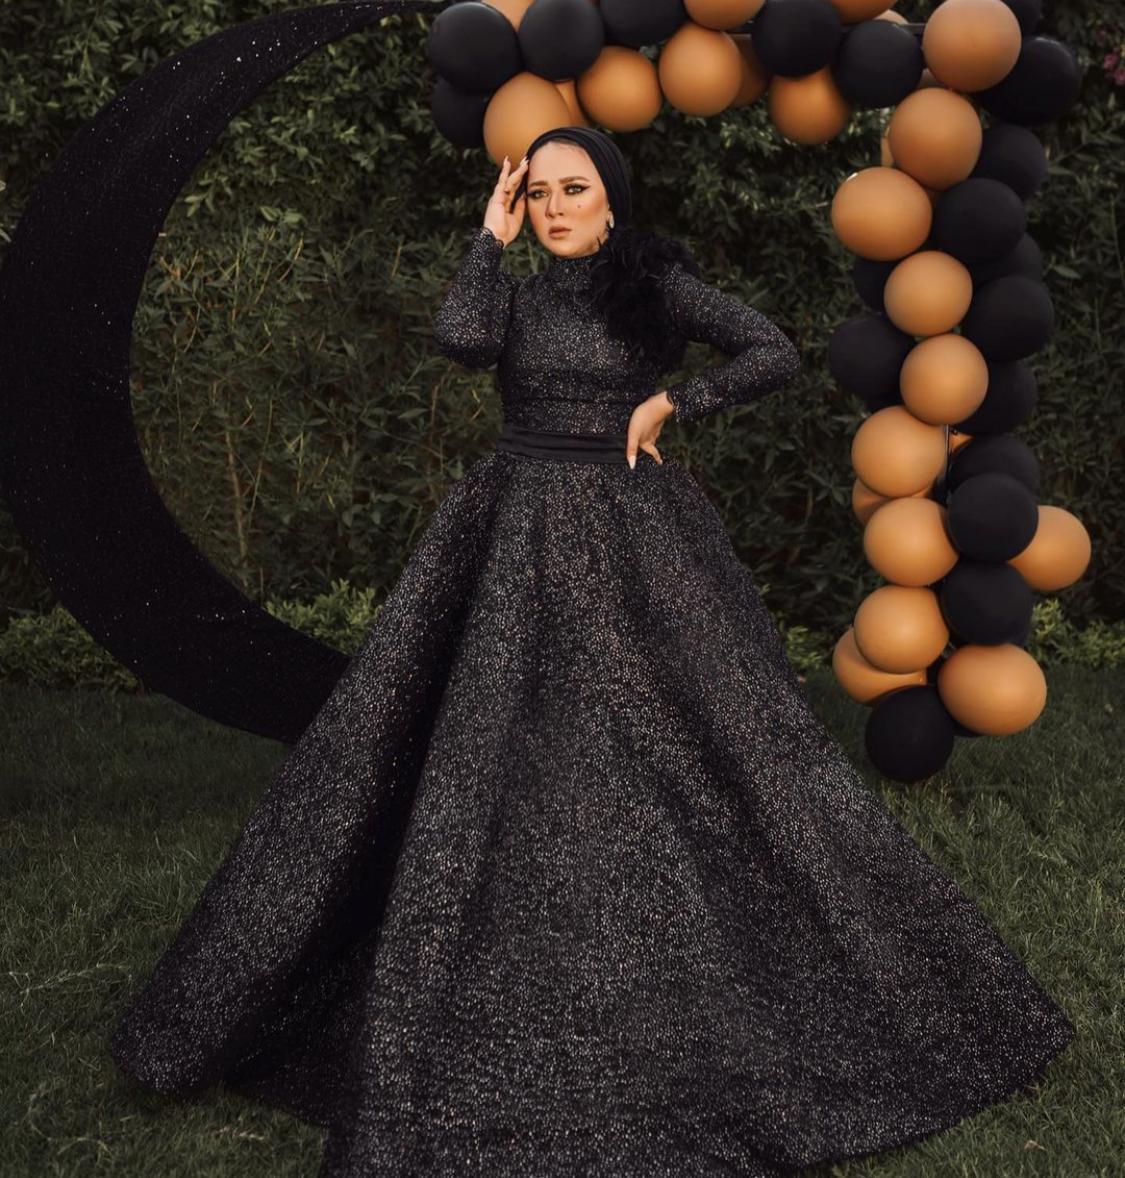 فستان اسود منفوش لخيار فاخر